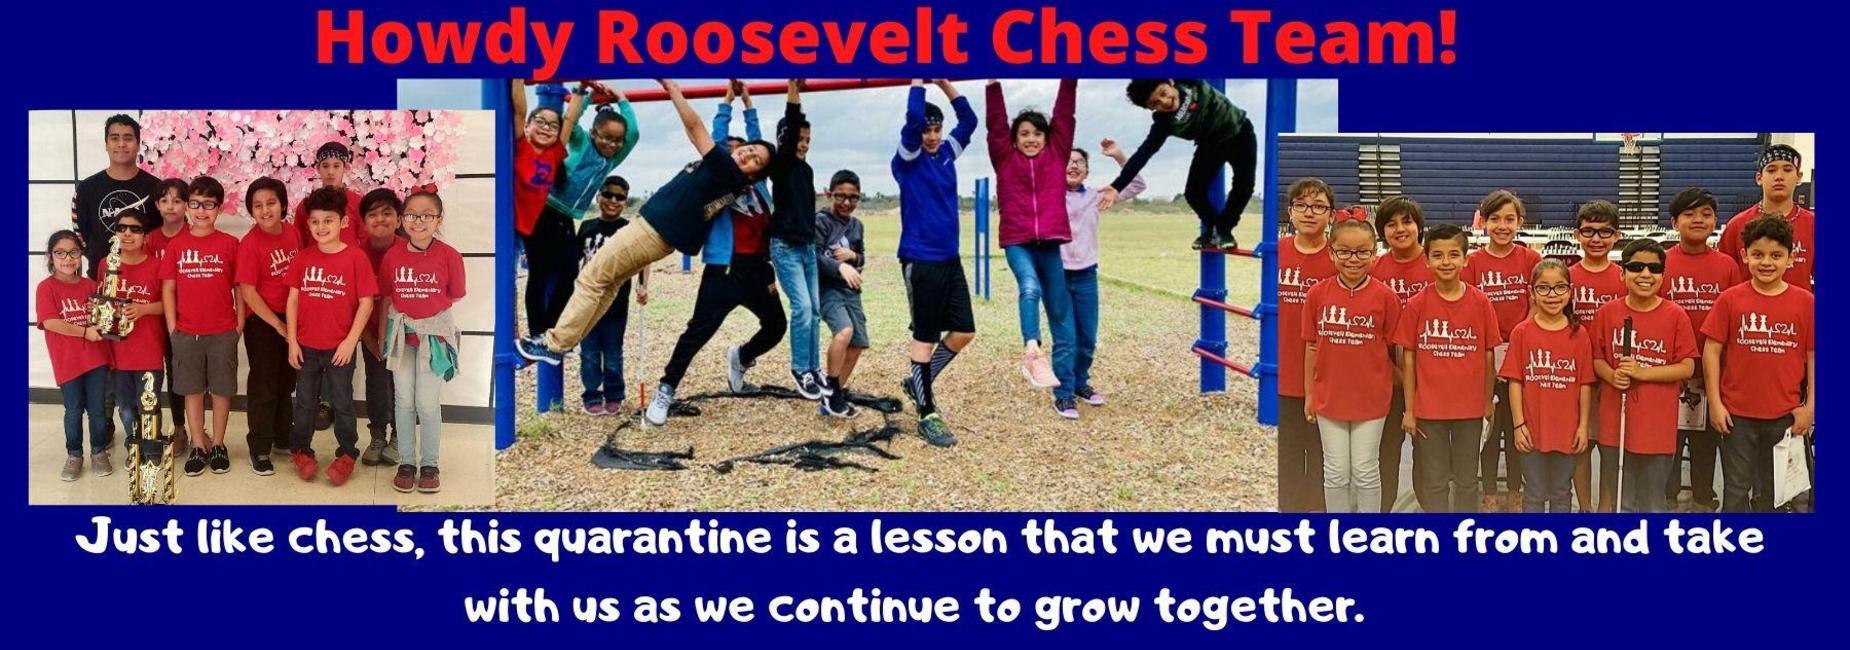 Howdy Roosevelt Chess Team